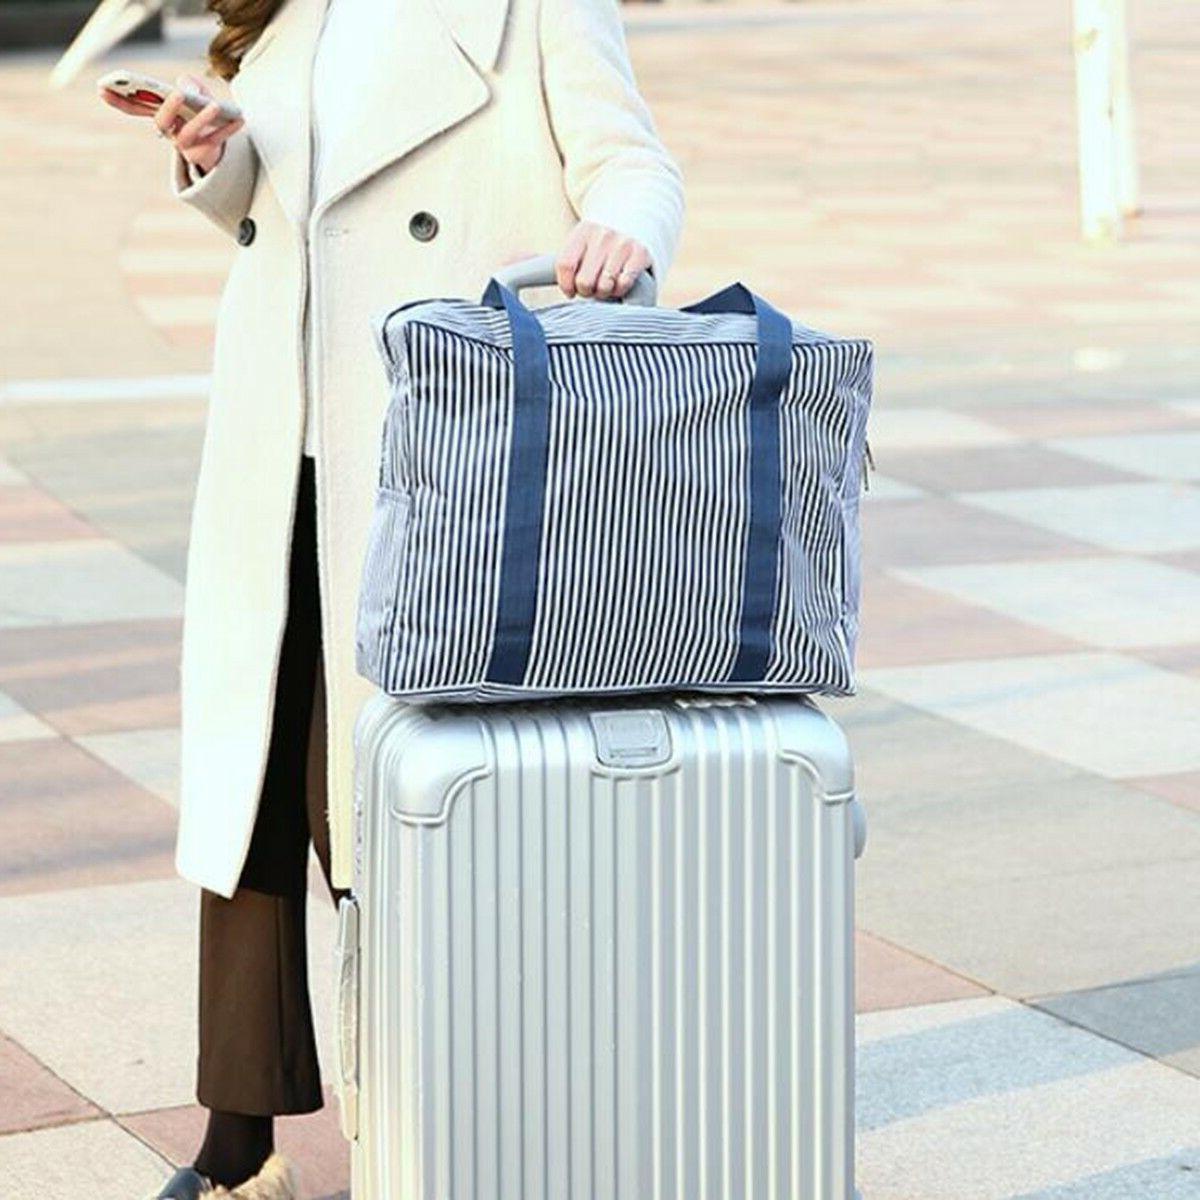 Waterproof Portable Travel Bag large Capacity Luggage Packing Bag